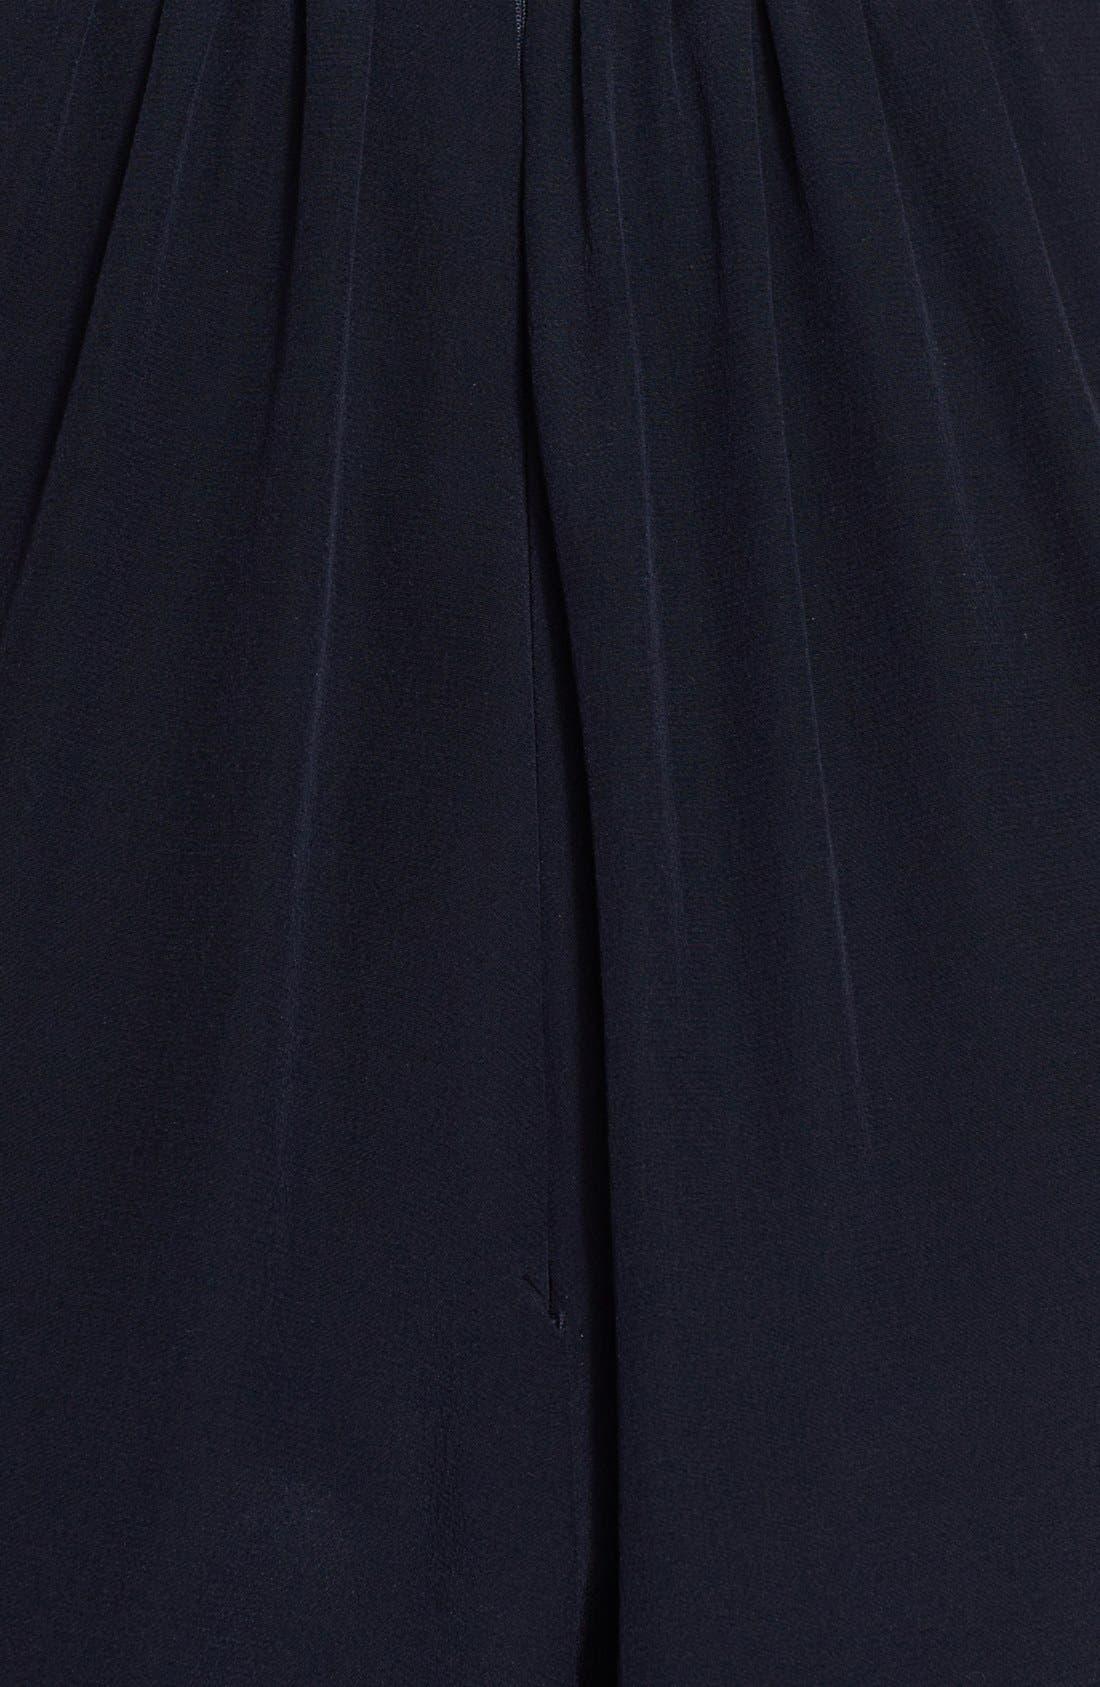 Alternate Image 3  - Victoria, Victoria Beckham Silk Crêpe de Chine Dress